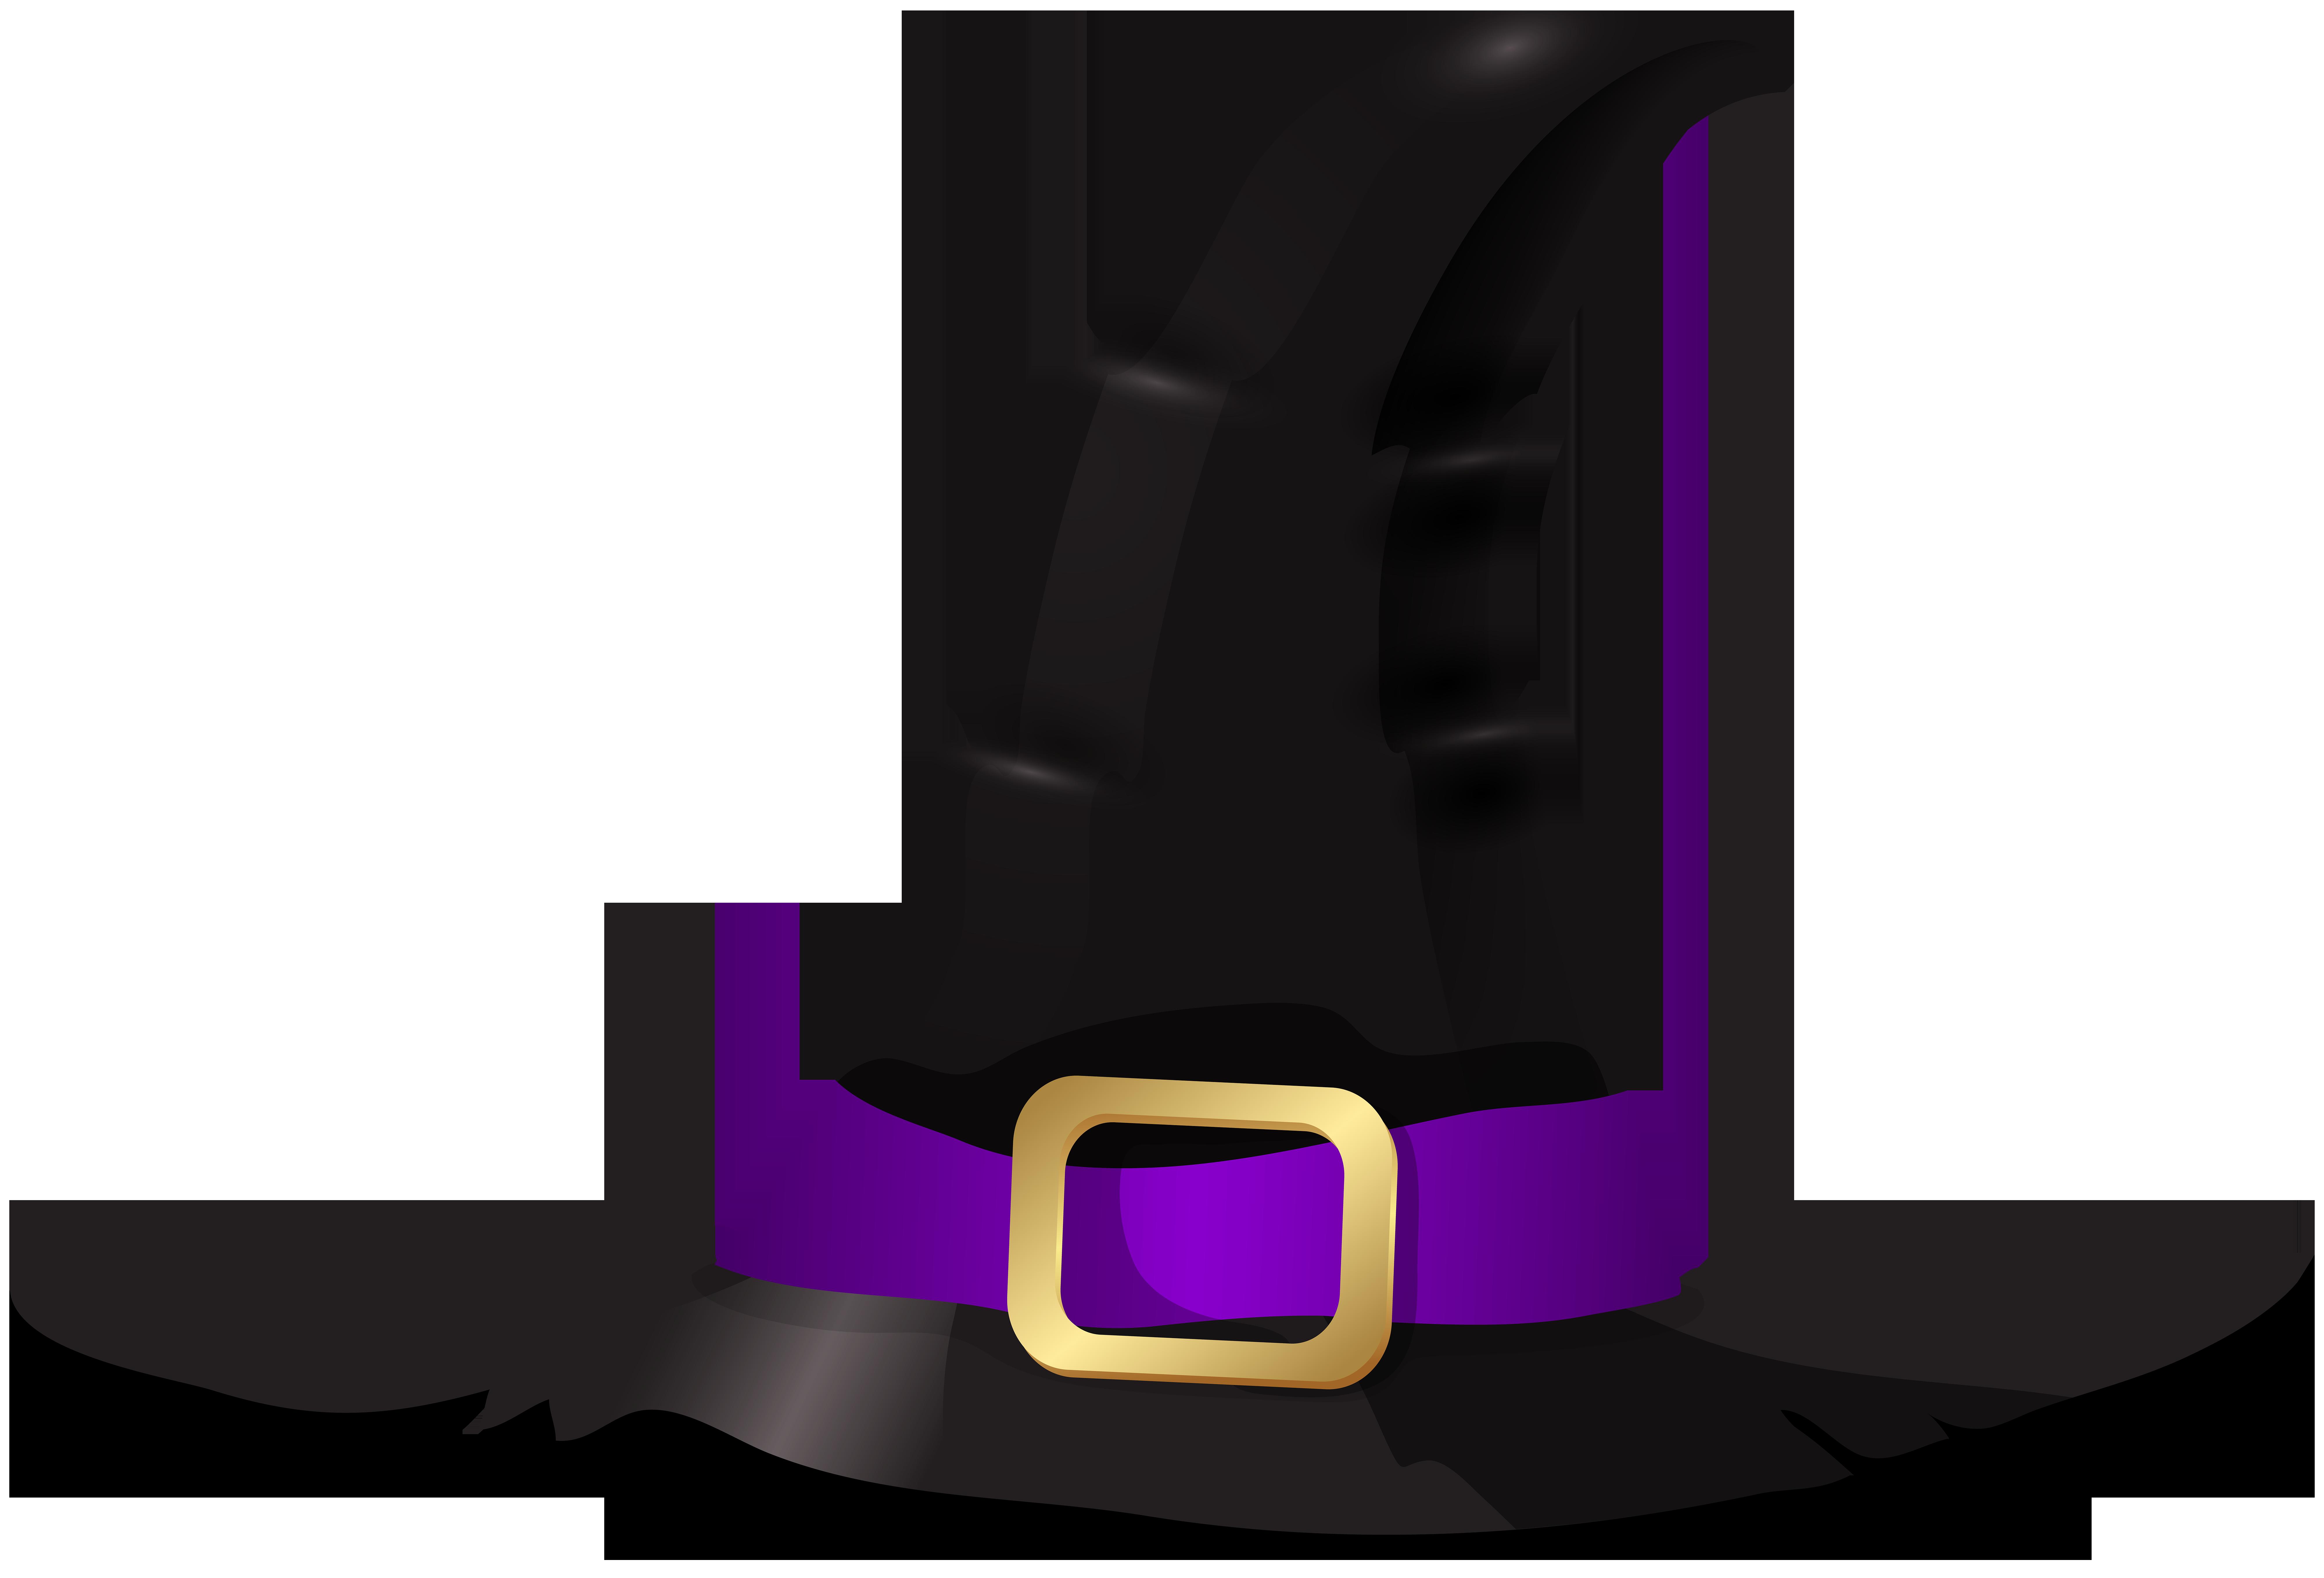 halloween witch hat clipart free download best halloween